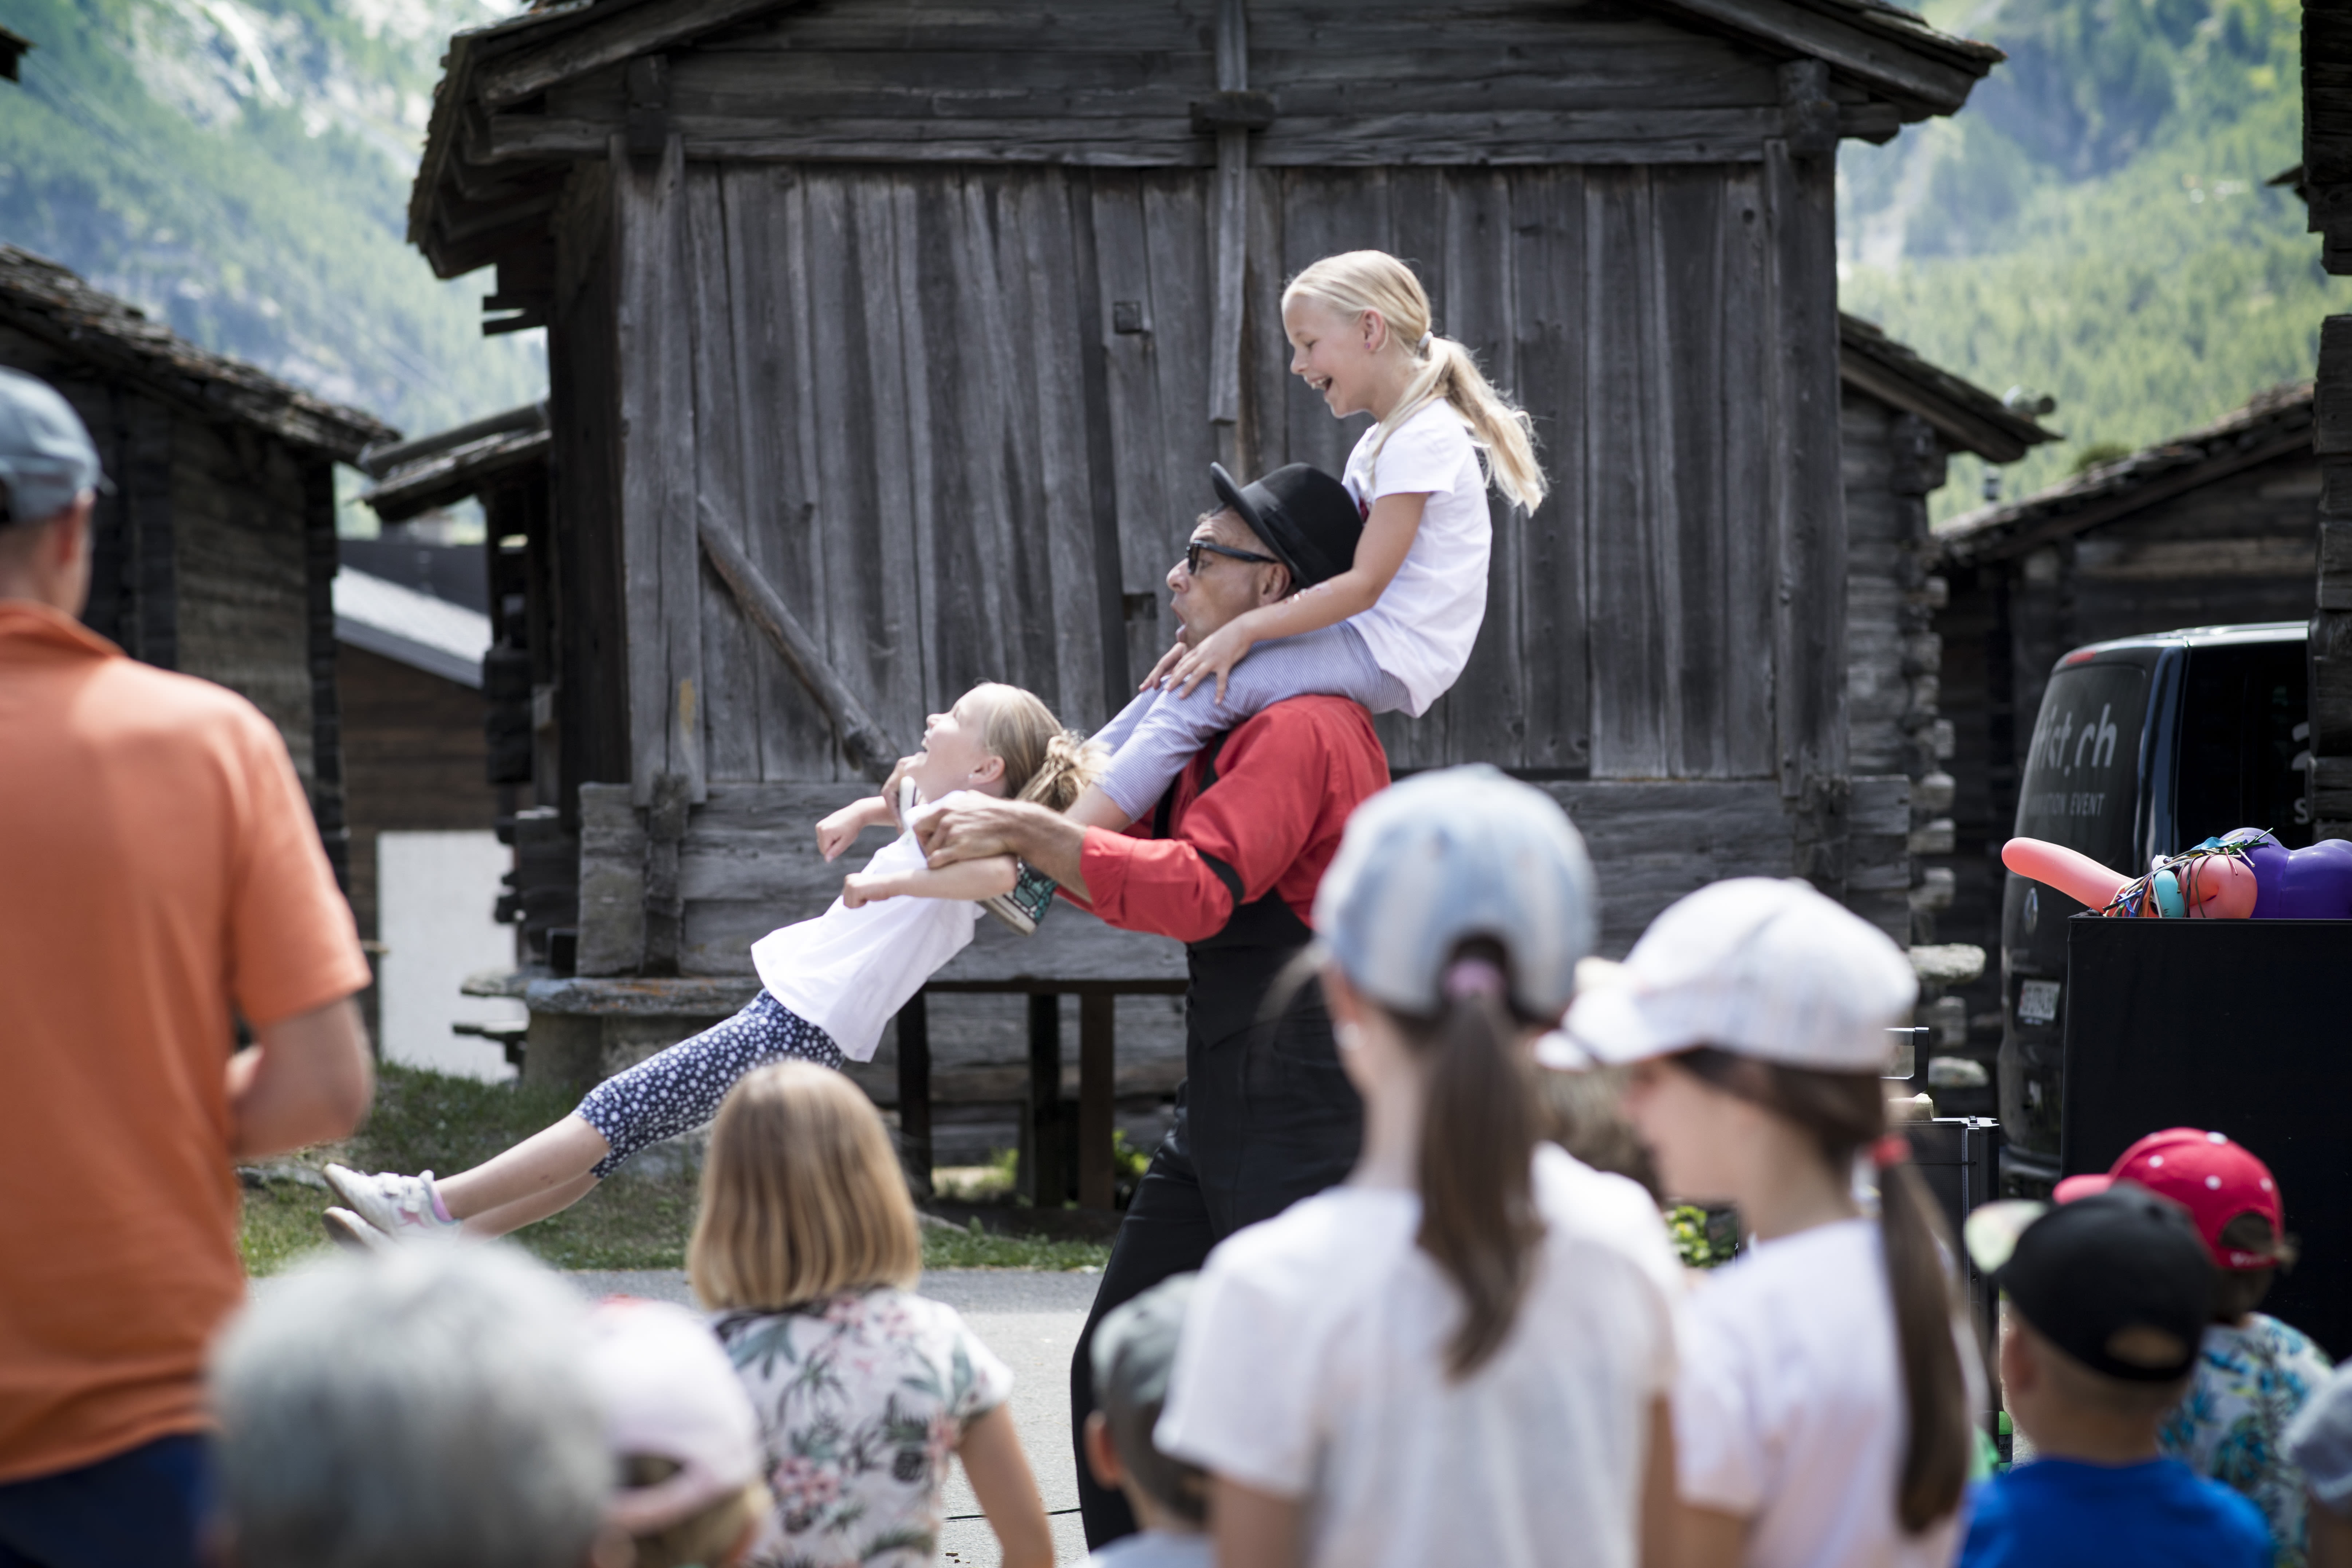 Familienaktivitäten im Sommer